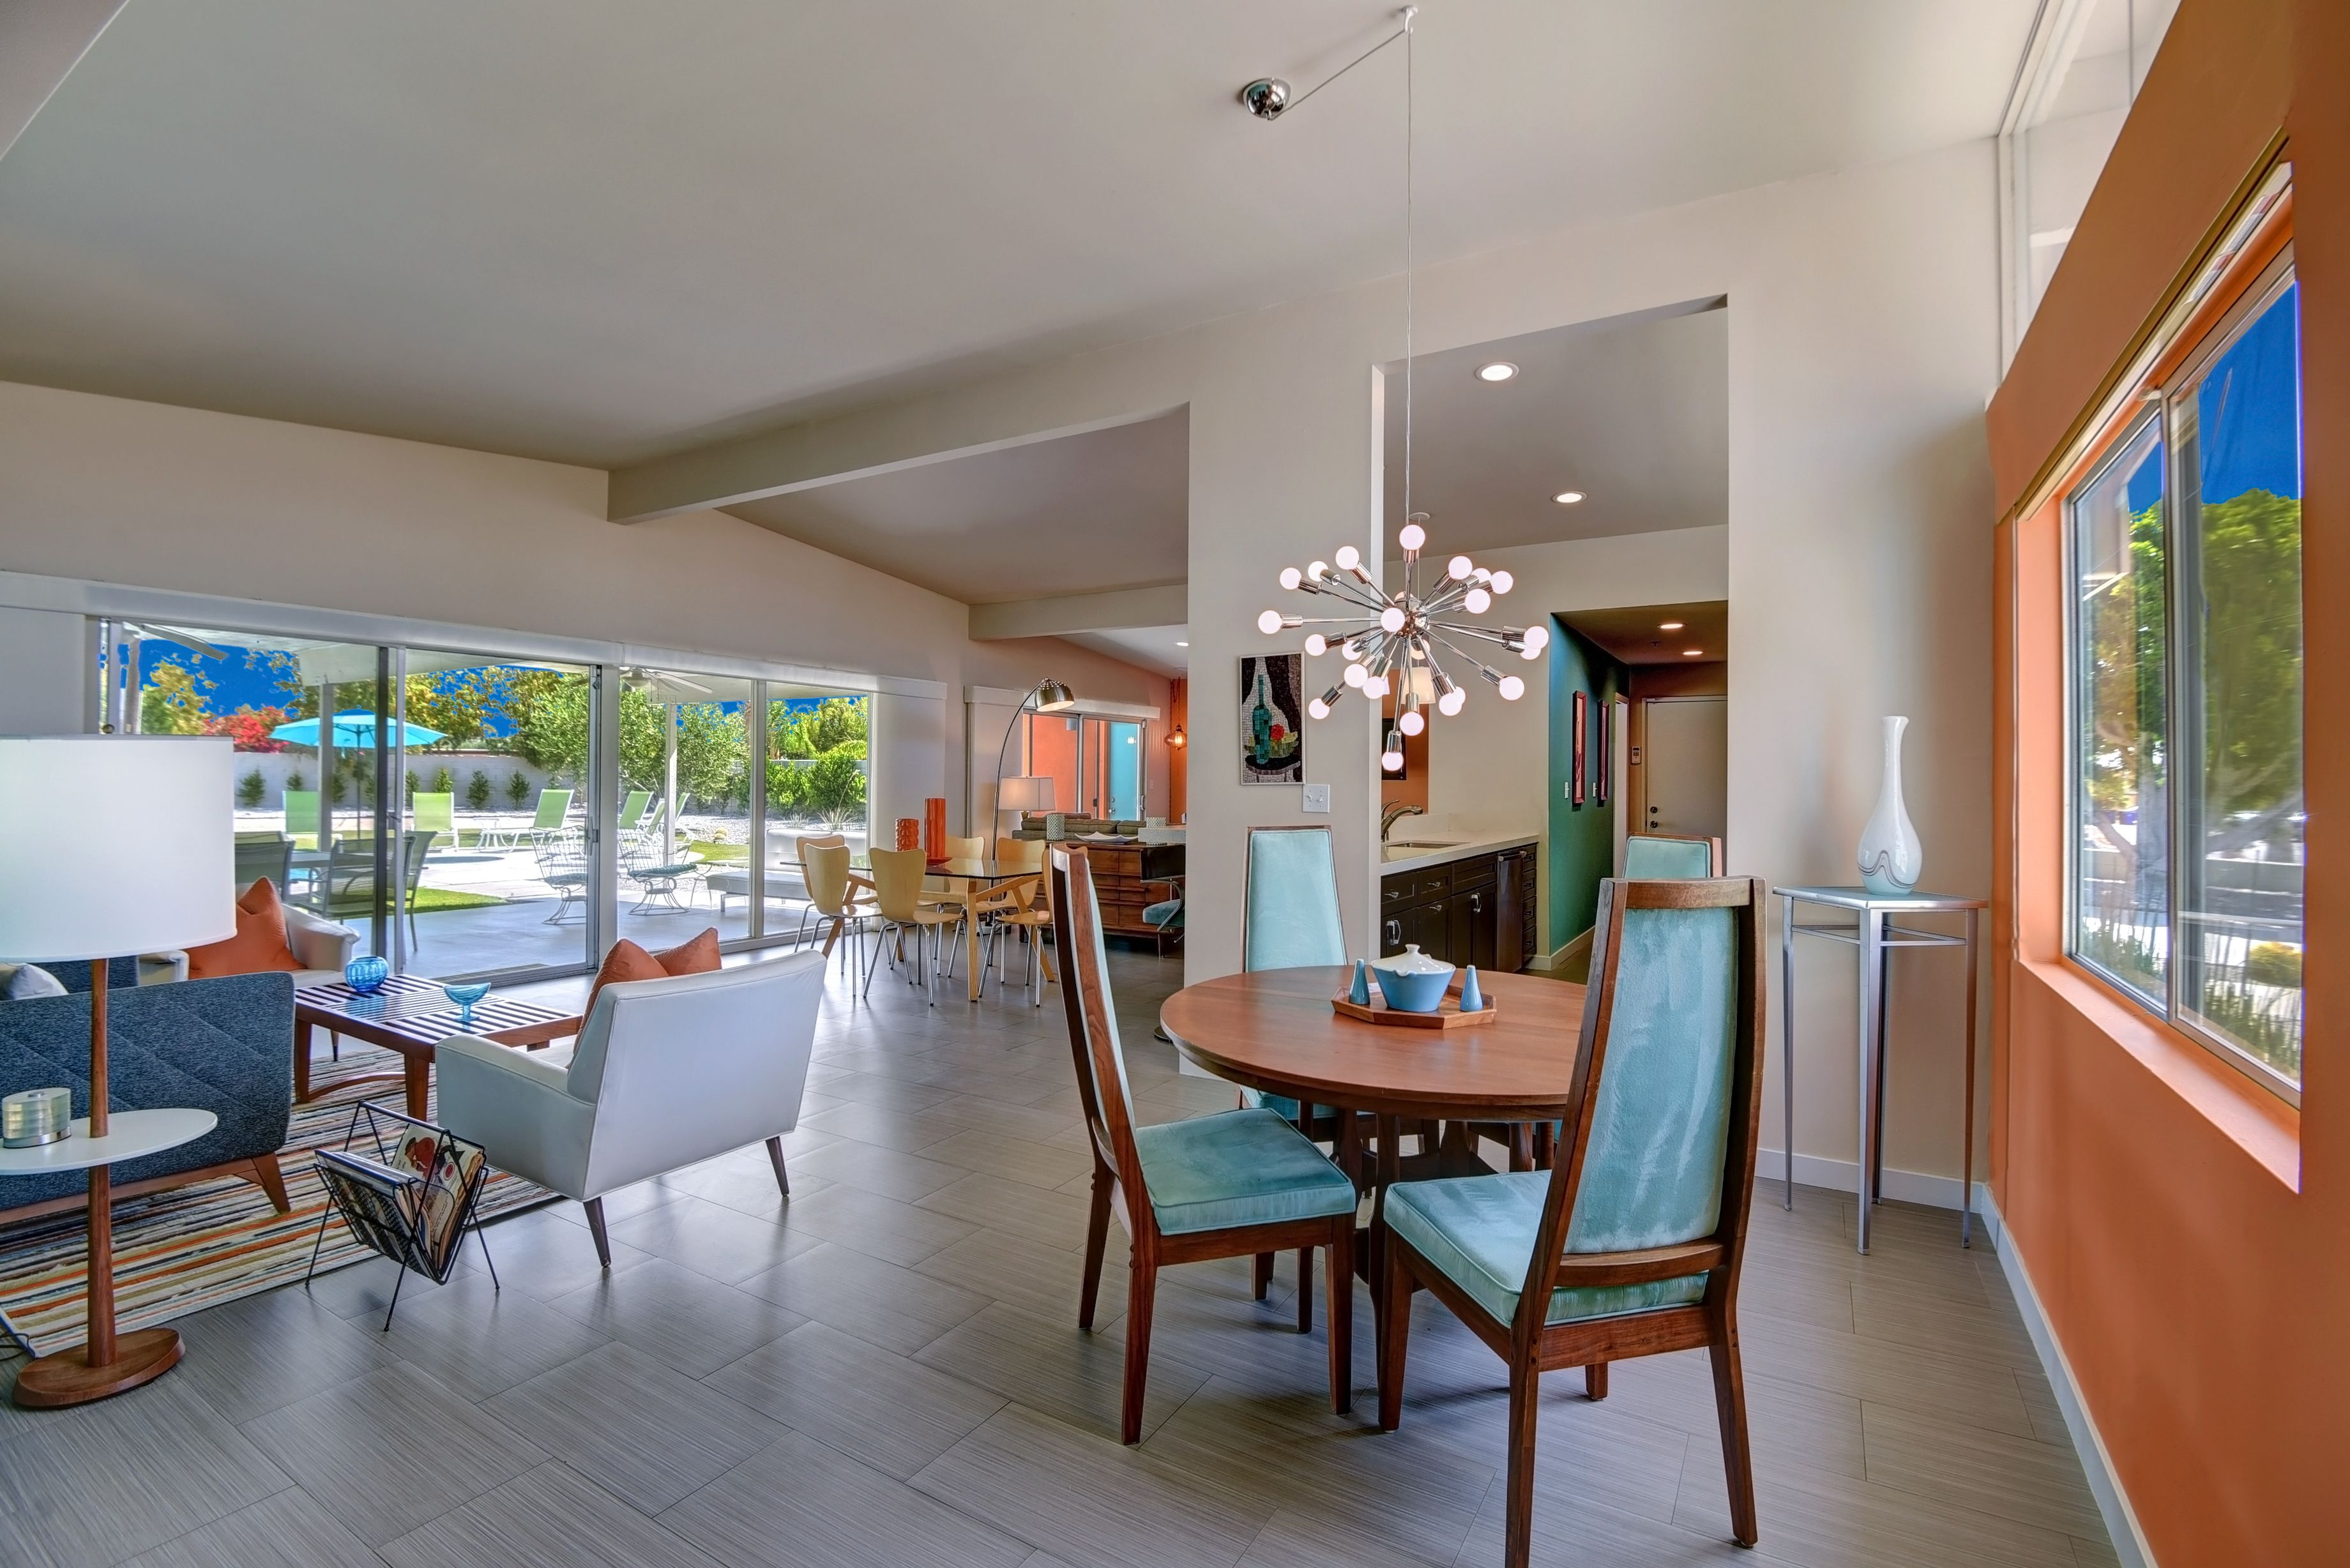 Hugh KapturPalm Springs Beachfront vacation rentals